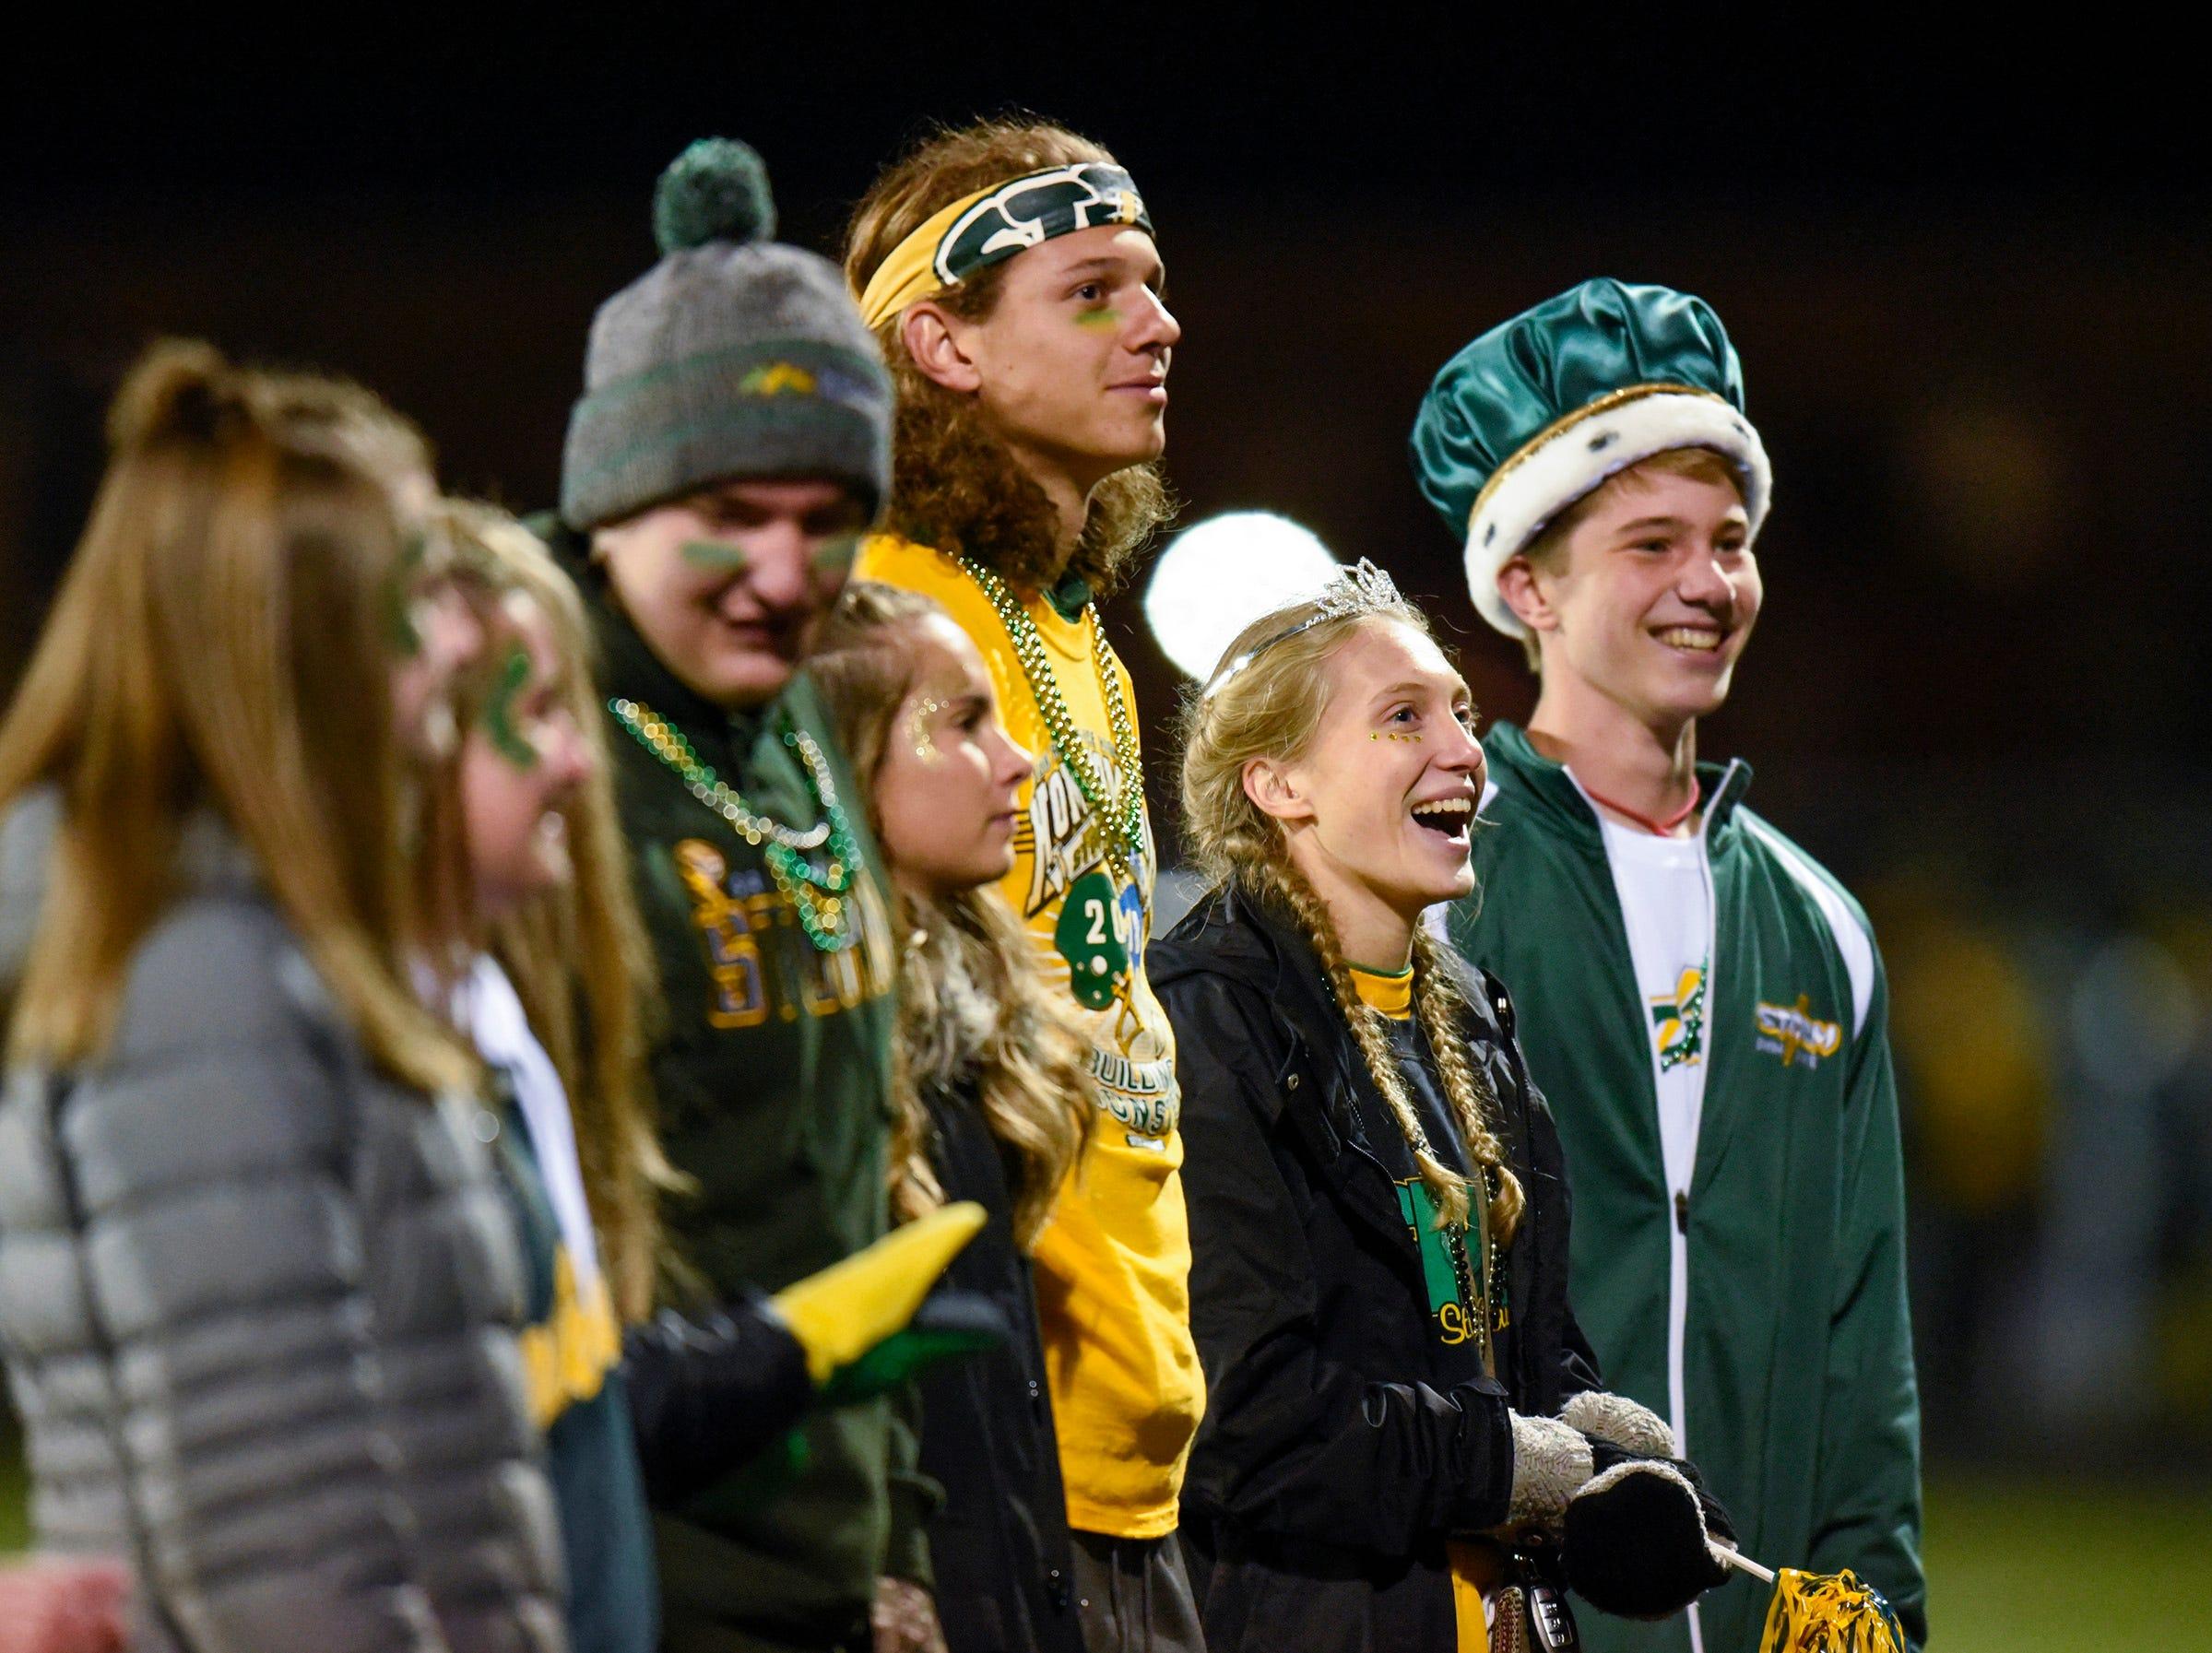 Sauk Rapids' homecoming royalty is introduced during halftime Friday, Sept. 28, in Sauk Rapids.